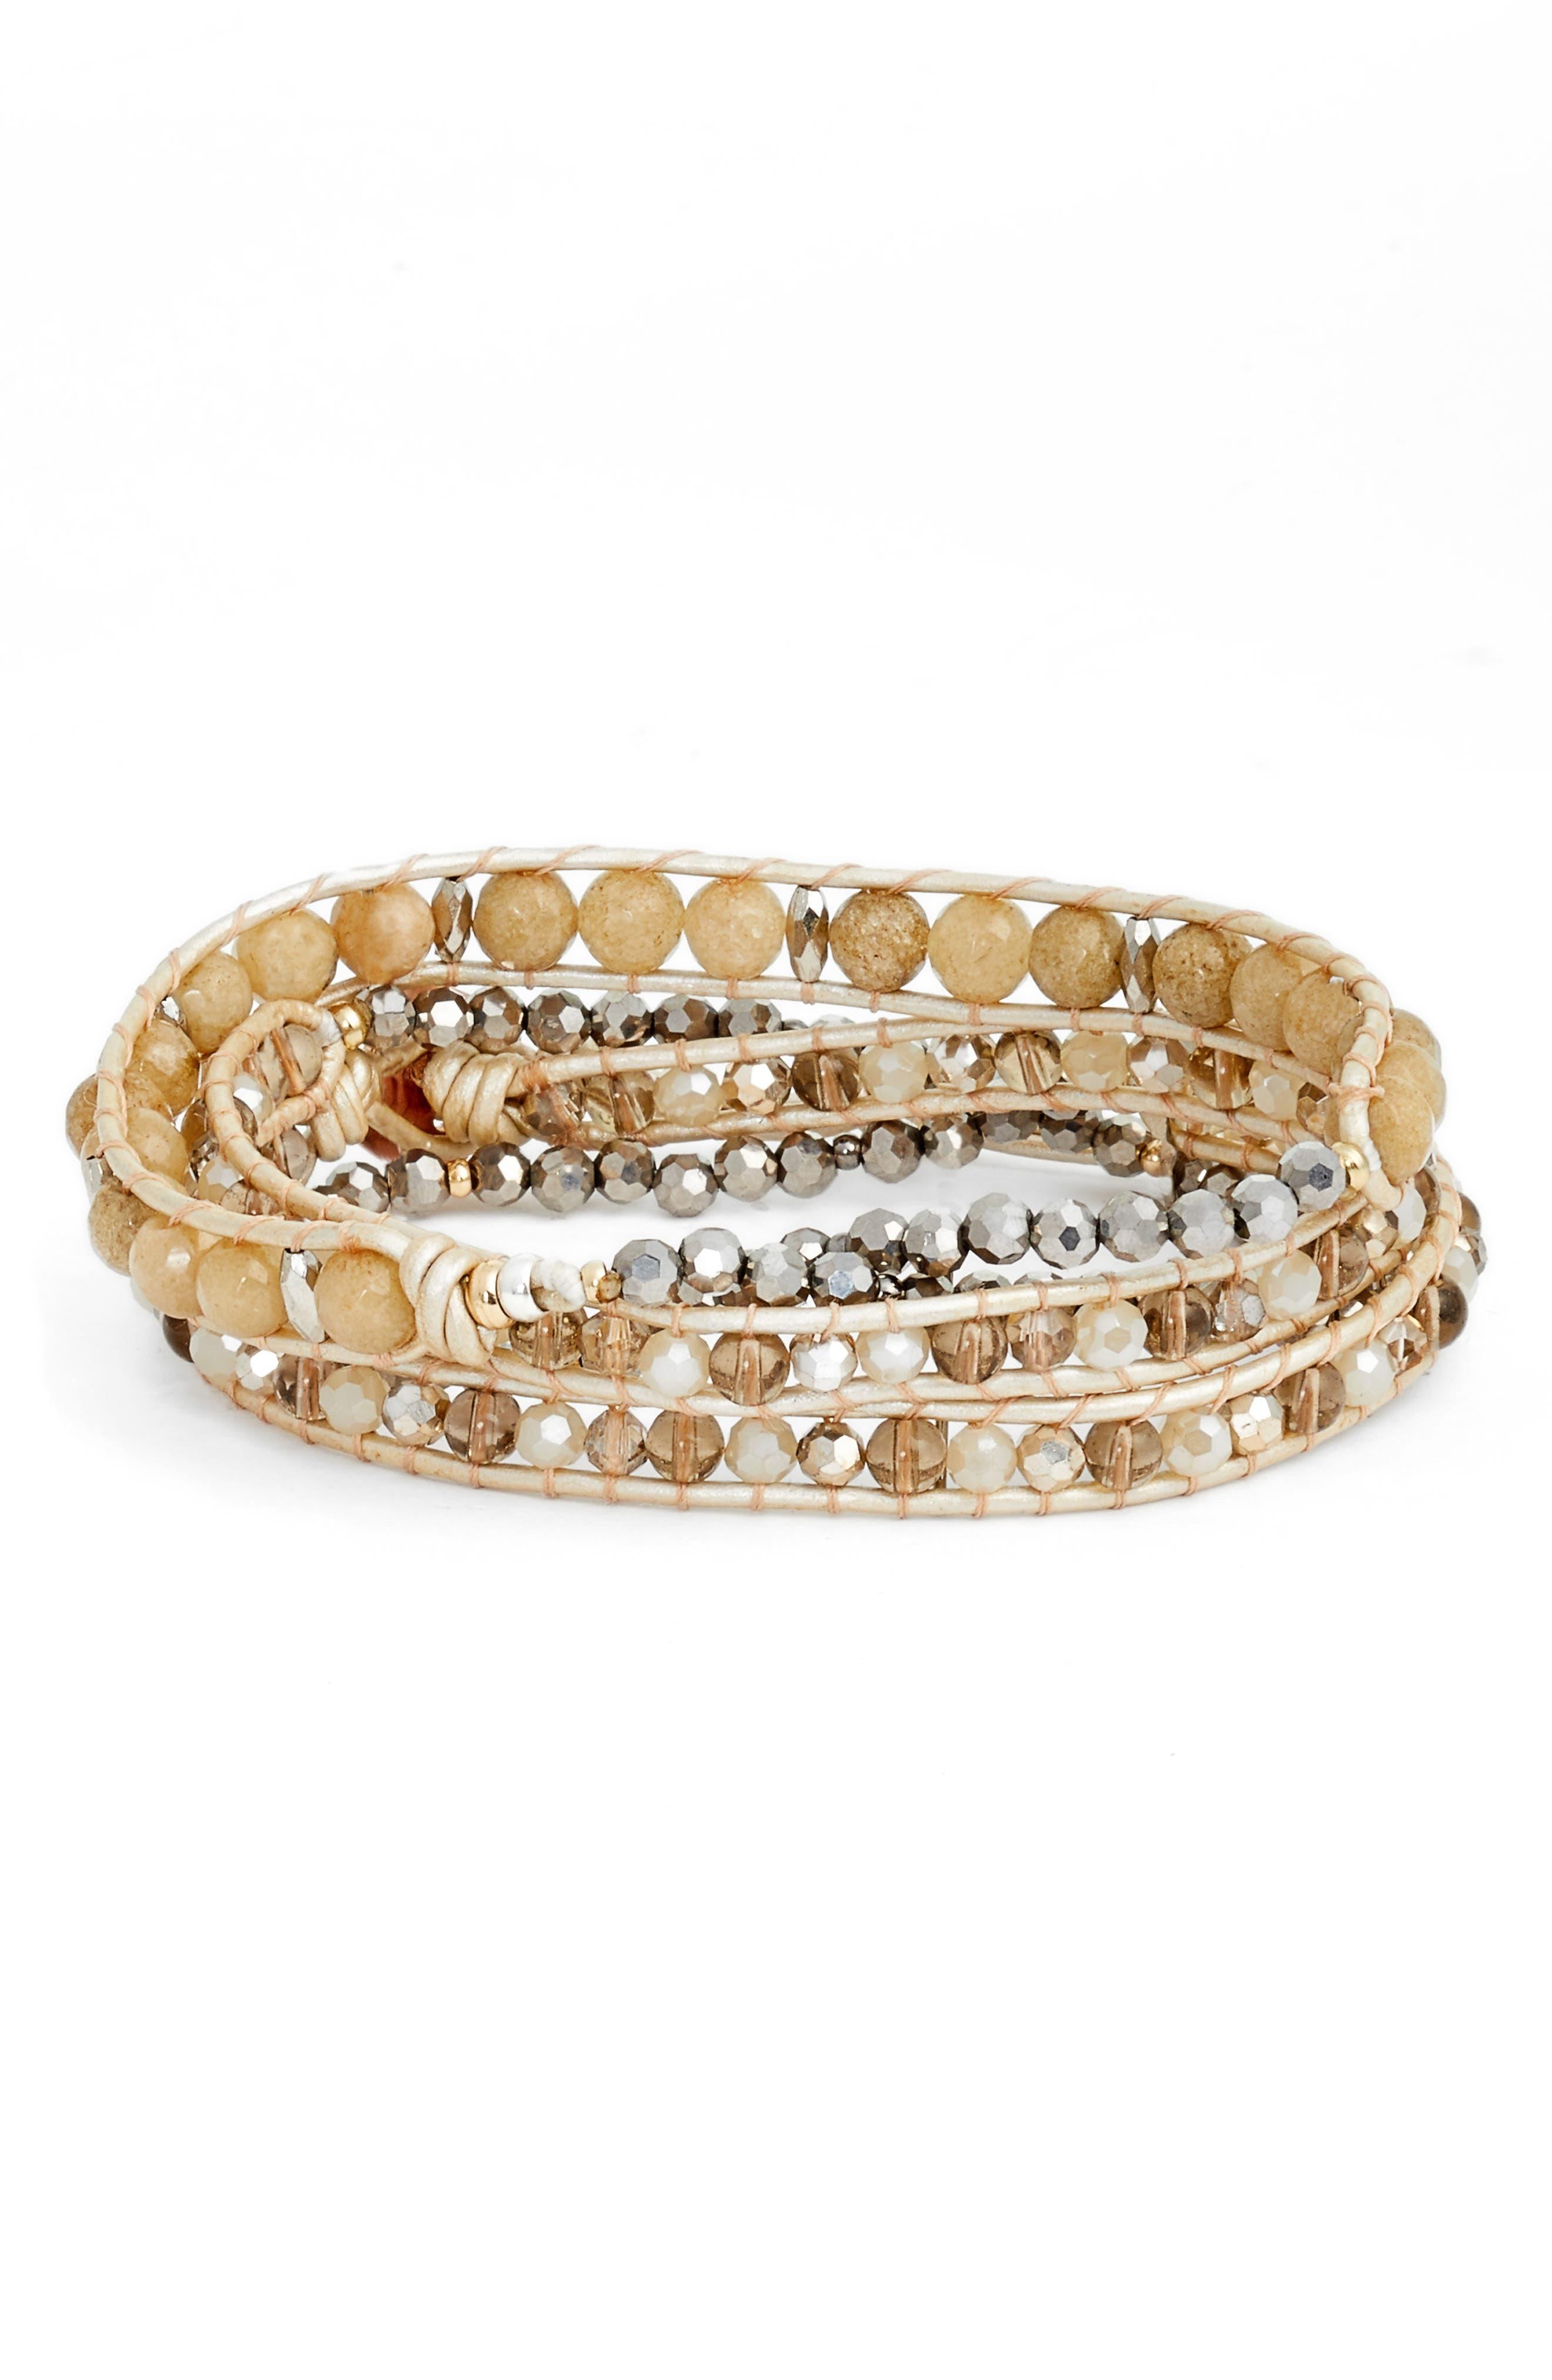 Beaded Wrap Bracelet,                             Main thumbnail 1, color,                             Cream